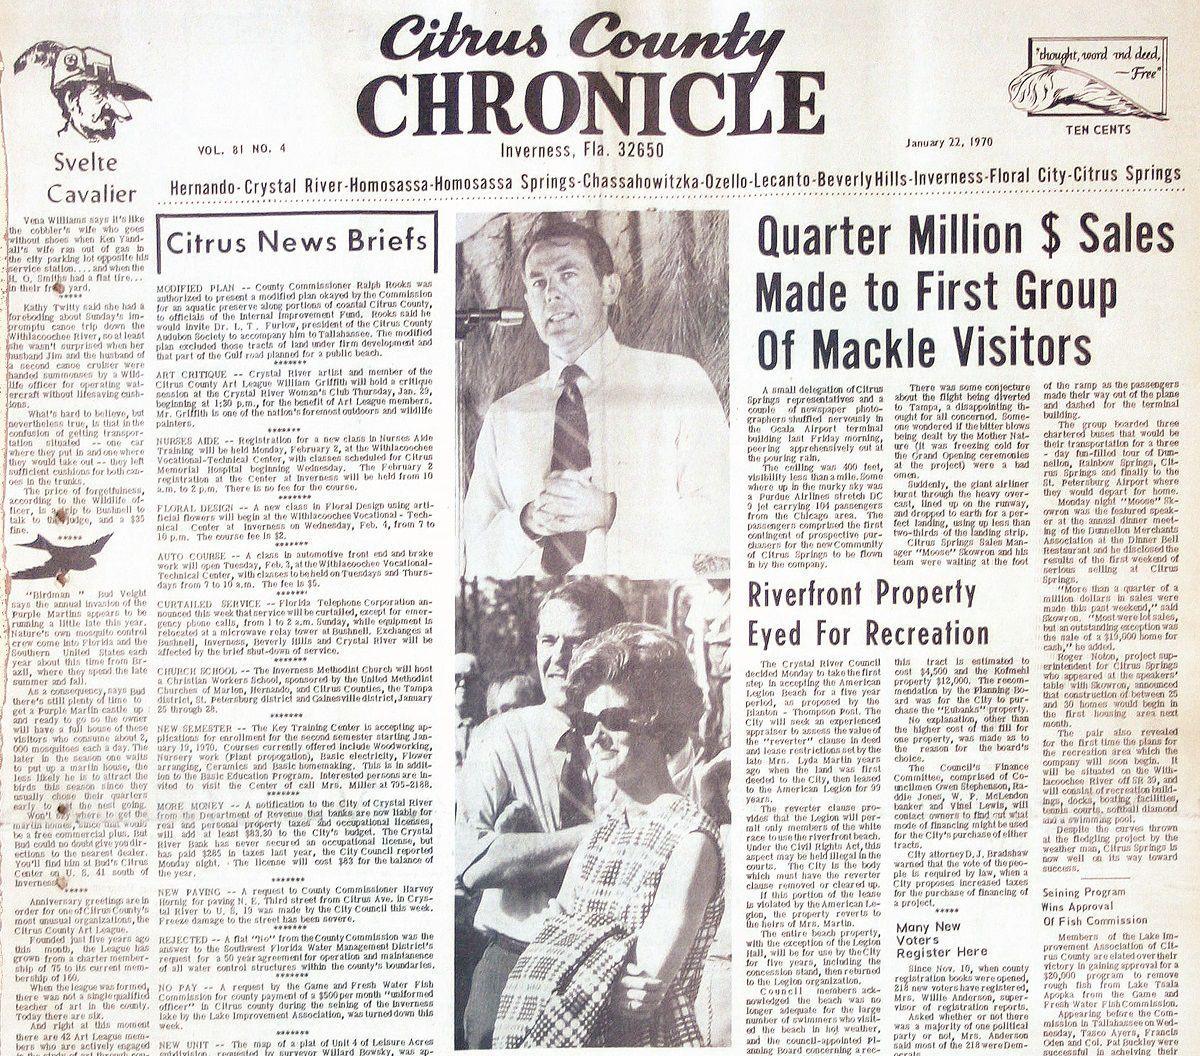 Citrus County Chronicle January 22, 1970